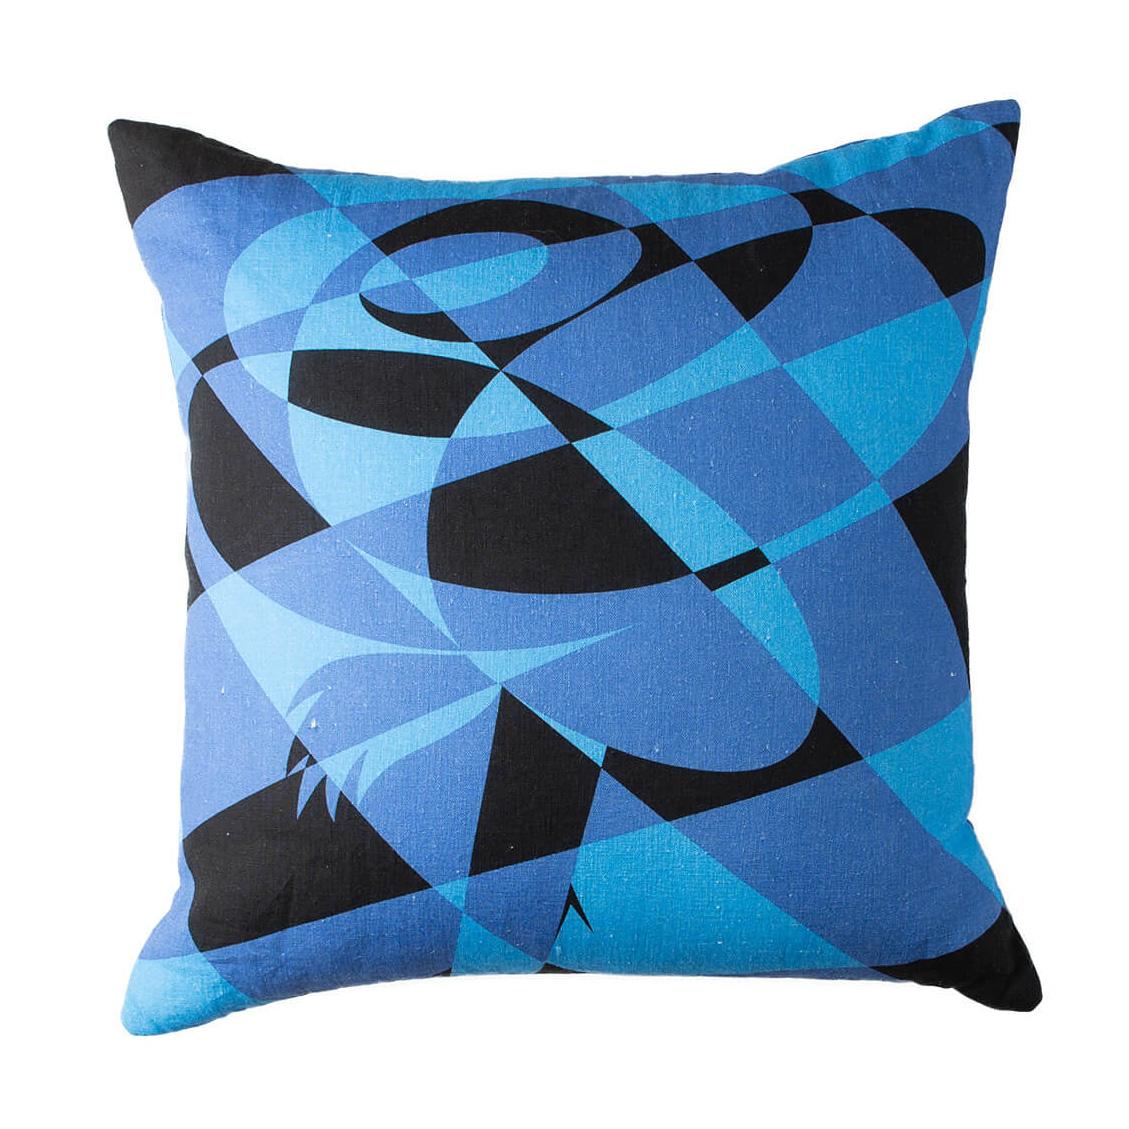 Clear Skies Blue Lumberjack Rose Throw Pillow